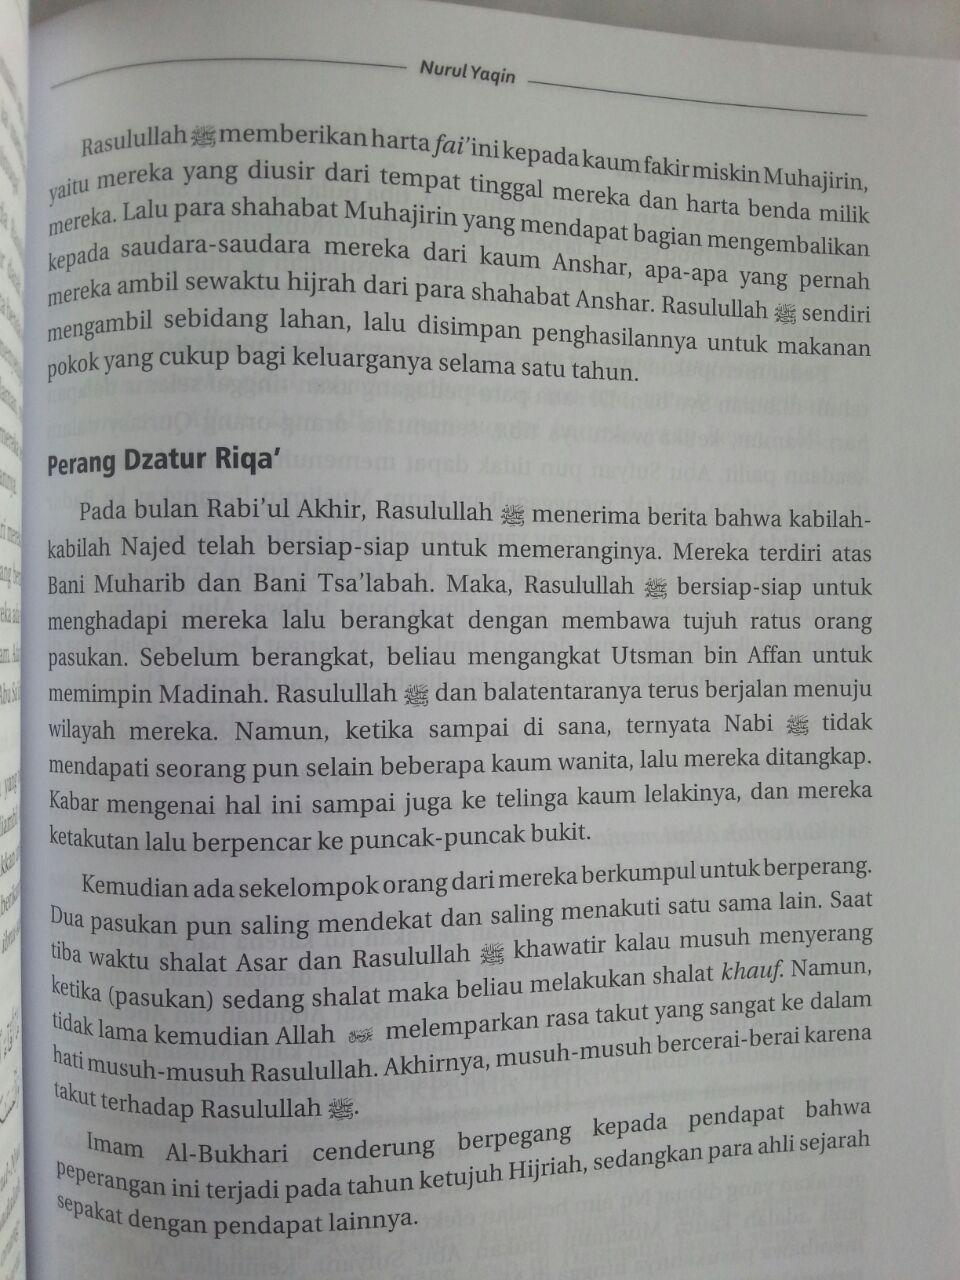 Buku Nurul Yakin Sirah Nabi Muhammad Pemimpin Para Rasul isi 4